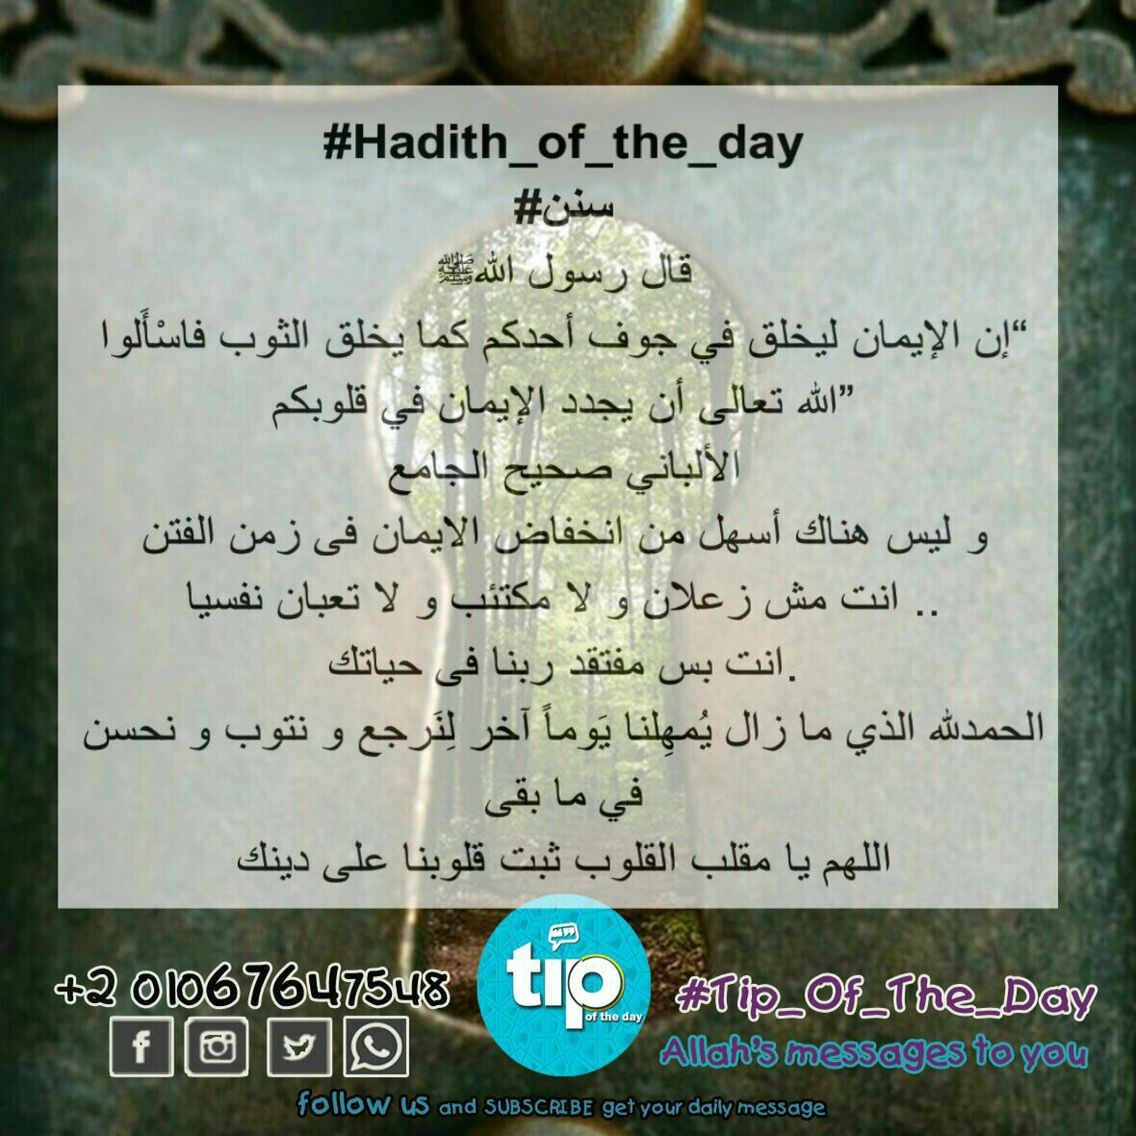 اللهم ثبت قلوبنا على دينك Allah Tip Of The Day Life Daily Sunan Hadith Of The Day Peace Be Upon Him Messages